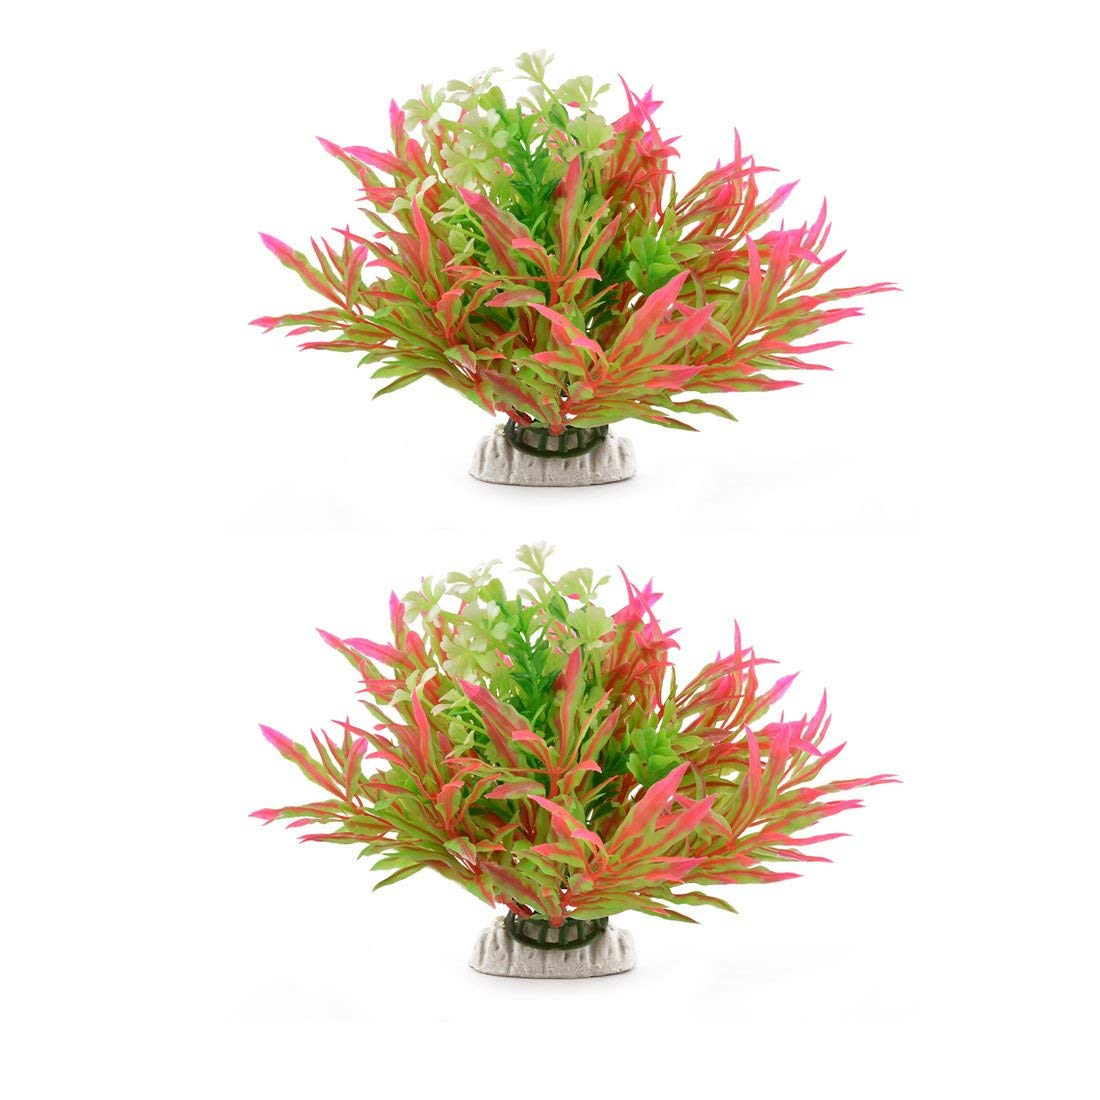 Aquarium Fish Tank Artificial Water Plant Grass Ornament bluee